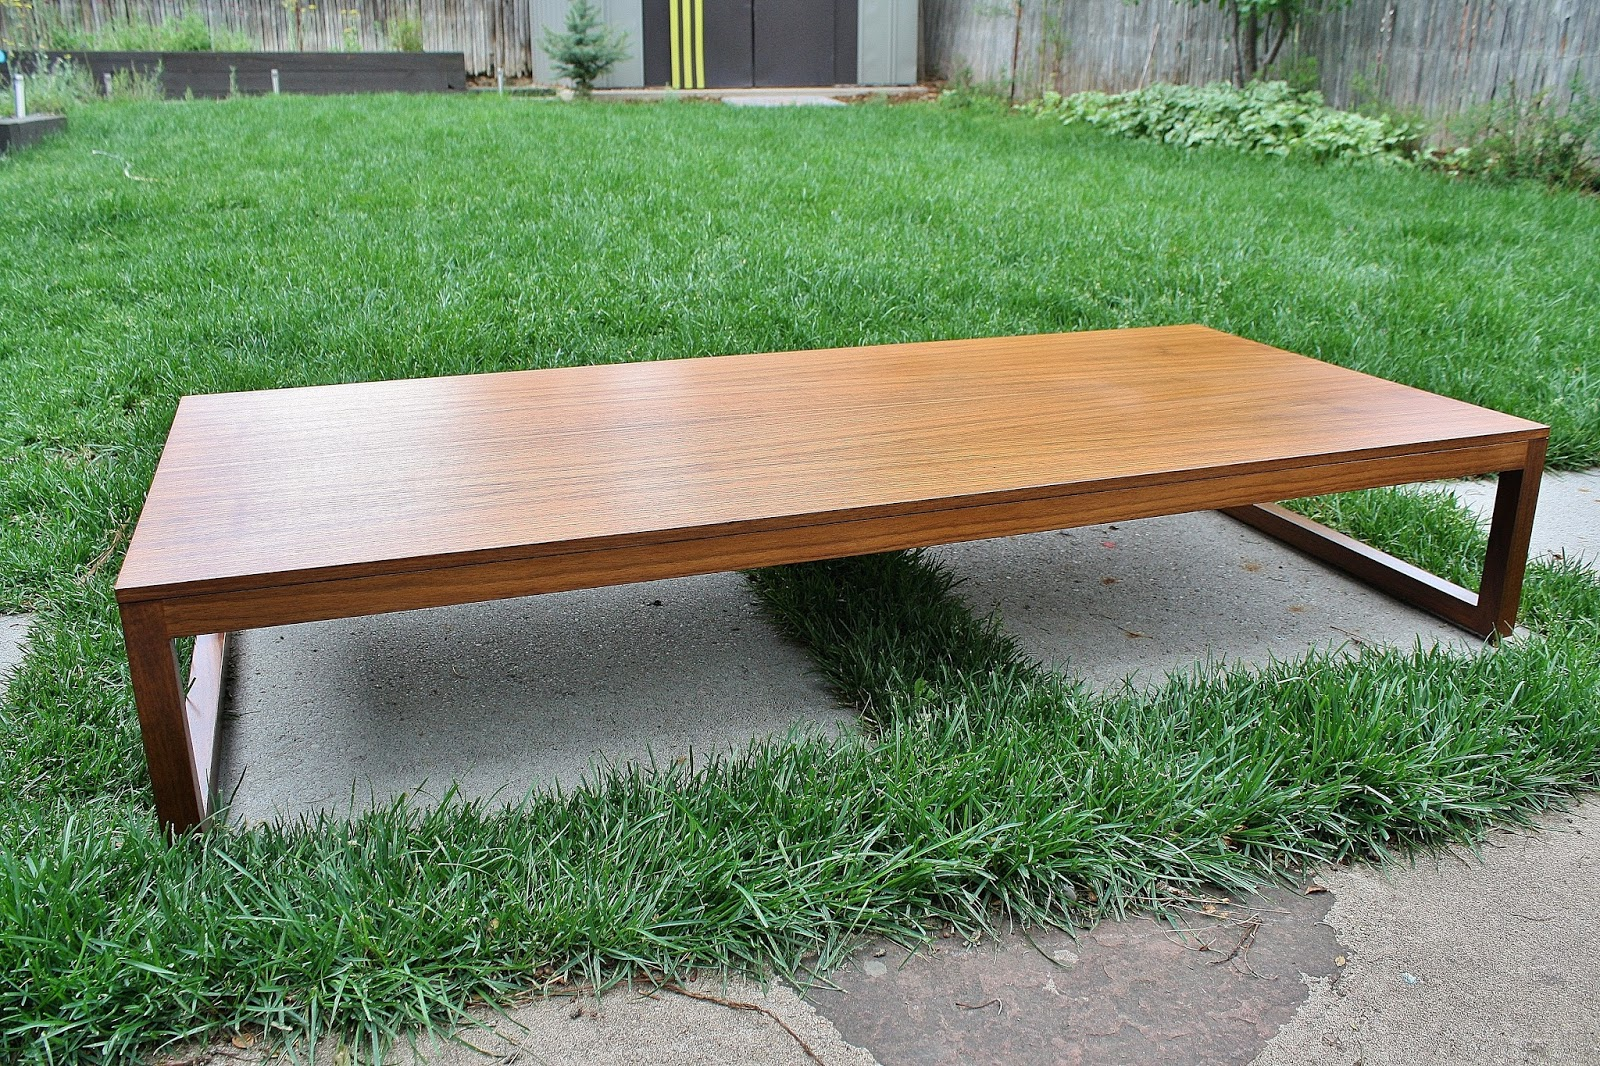 Modwerks Low Minimalist Walnut Coffee Table From Dwr